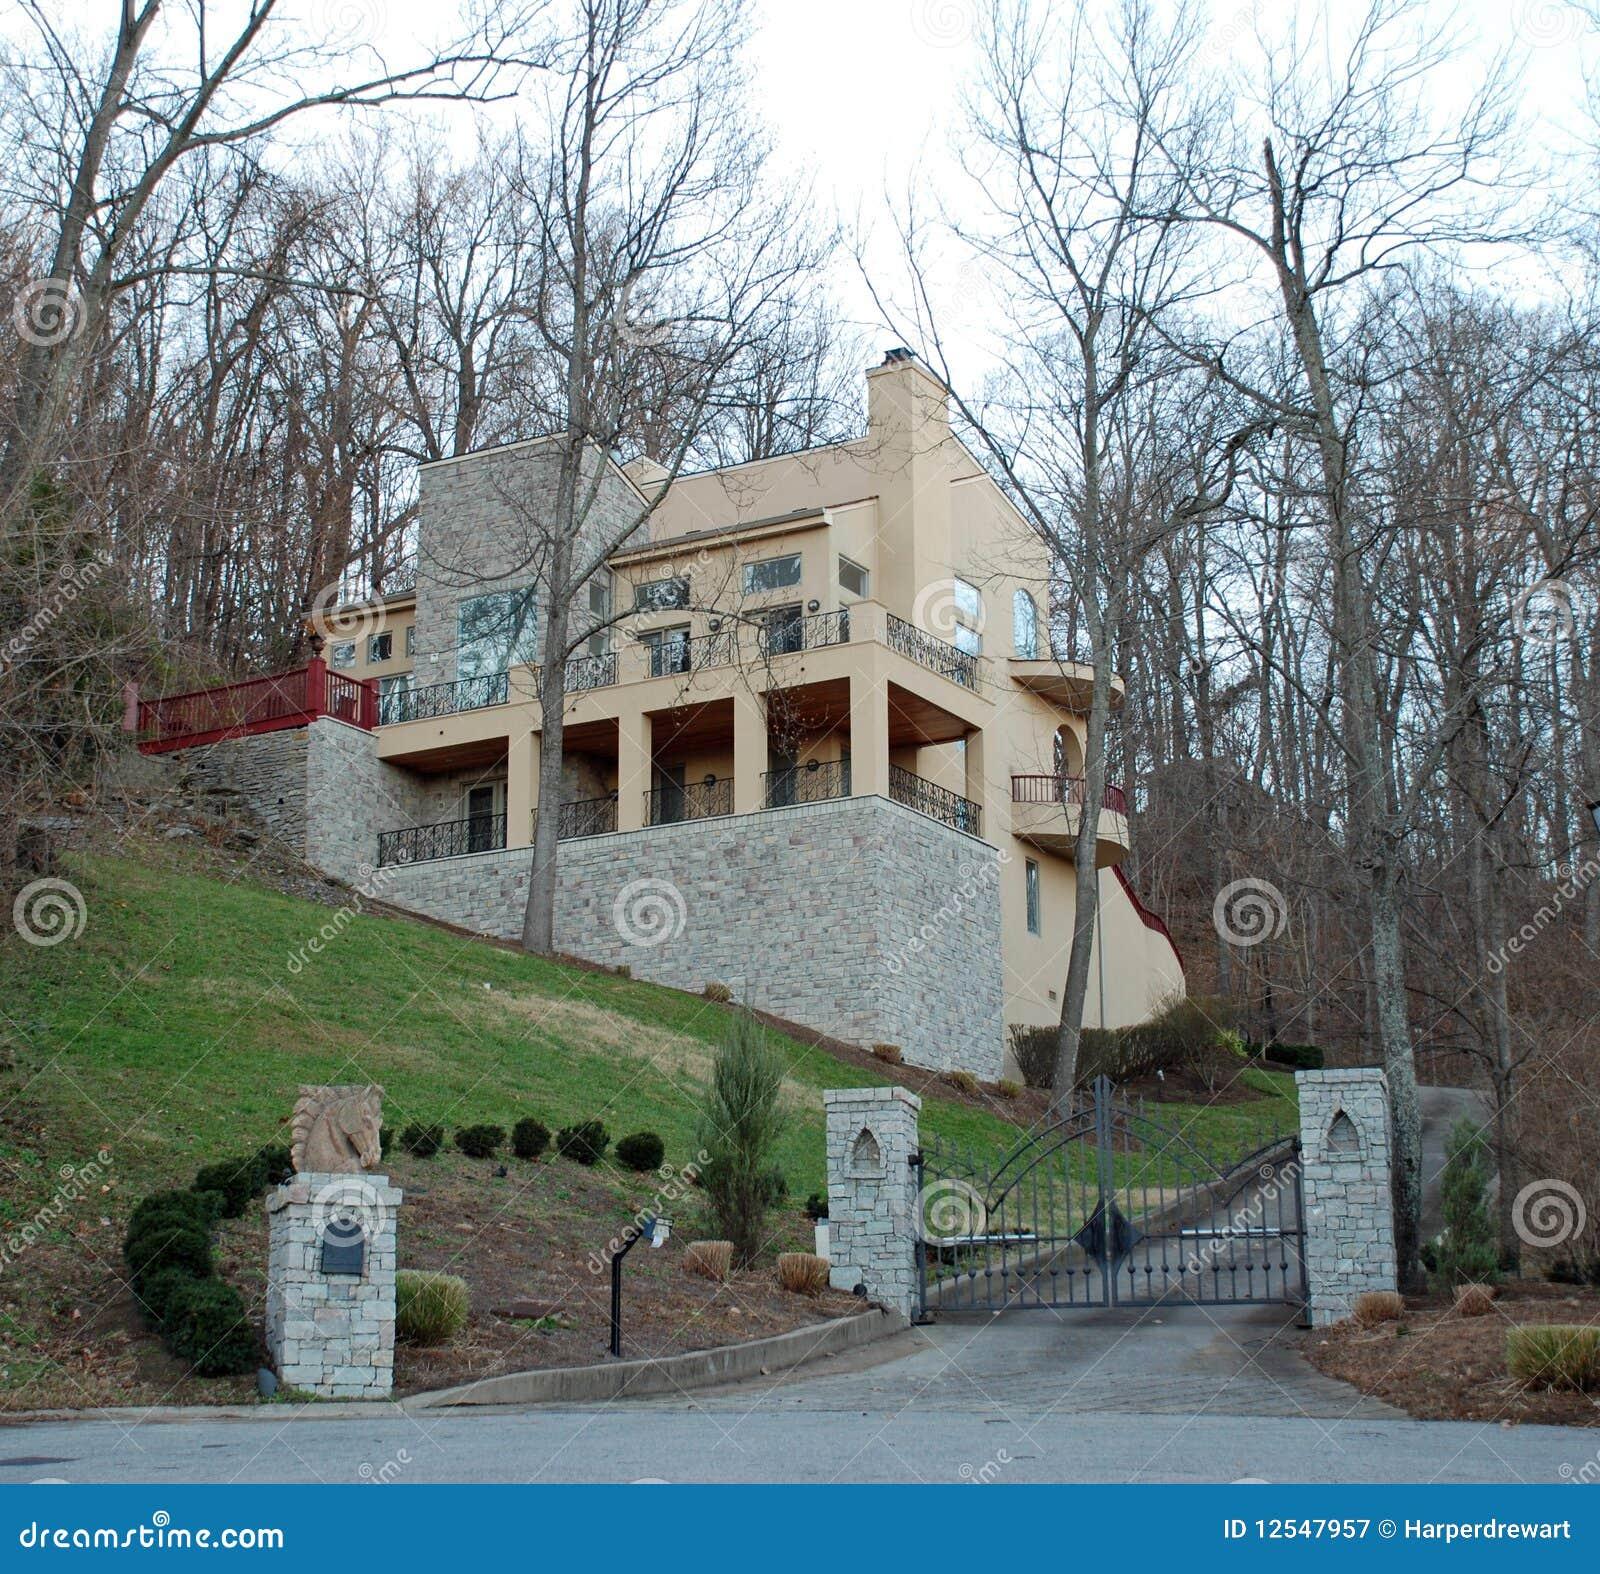 Stone Luxury Home Designs: Modern Hillside Stone Luxury Home 36 Stock Image